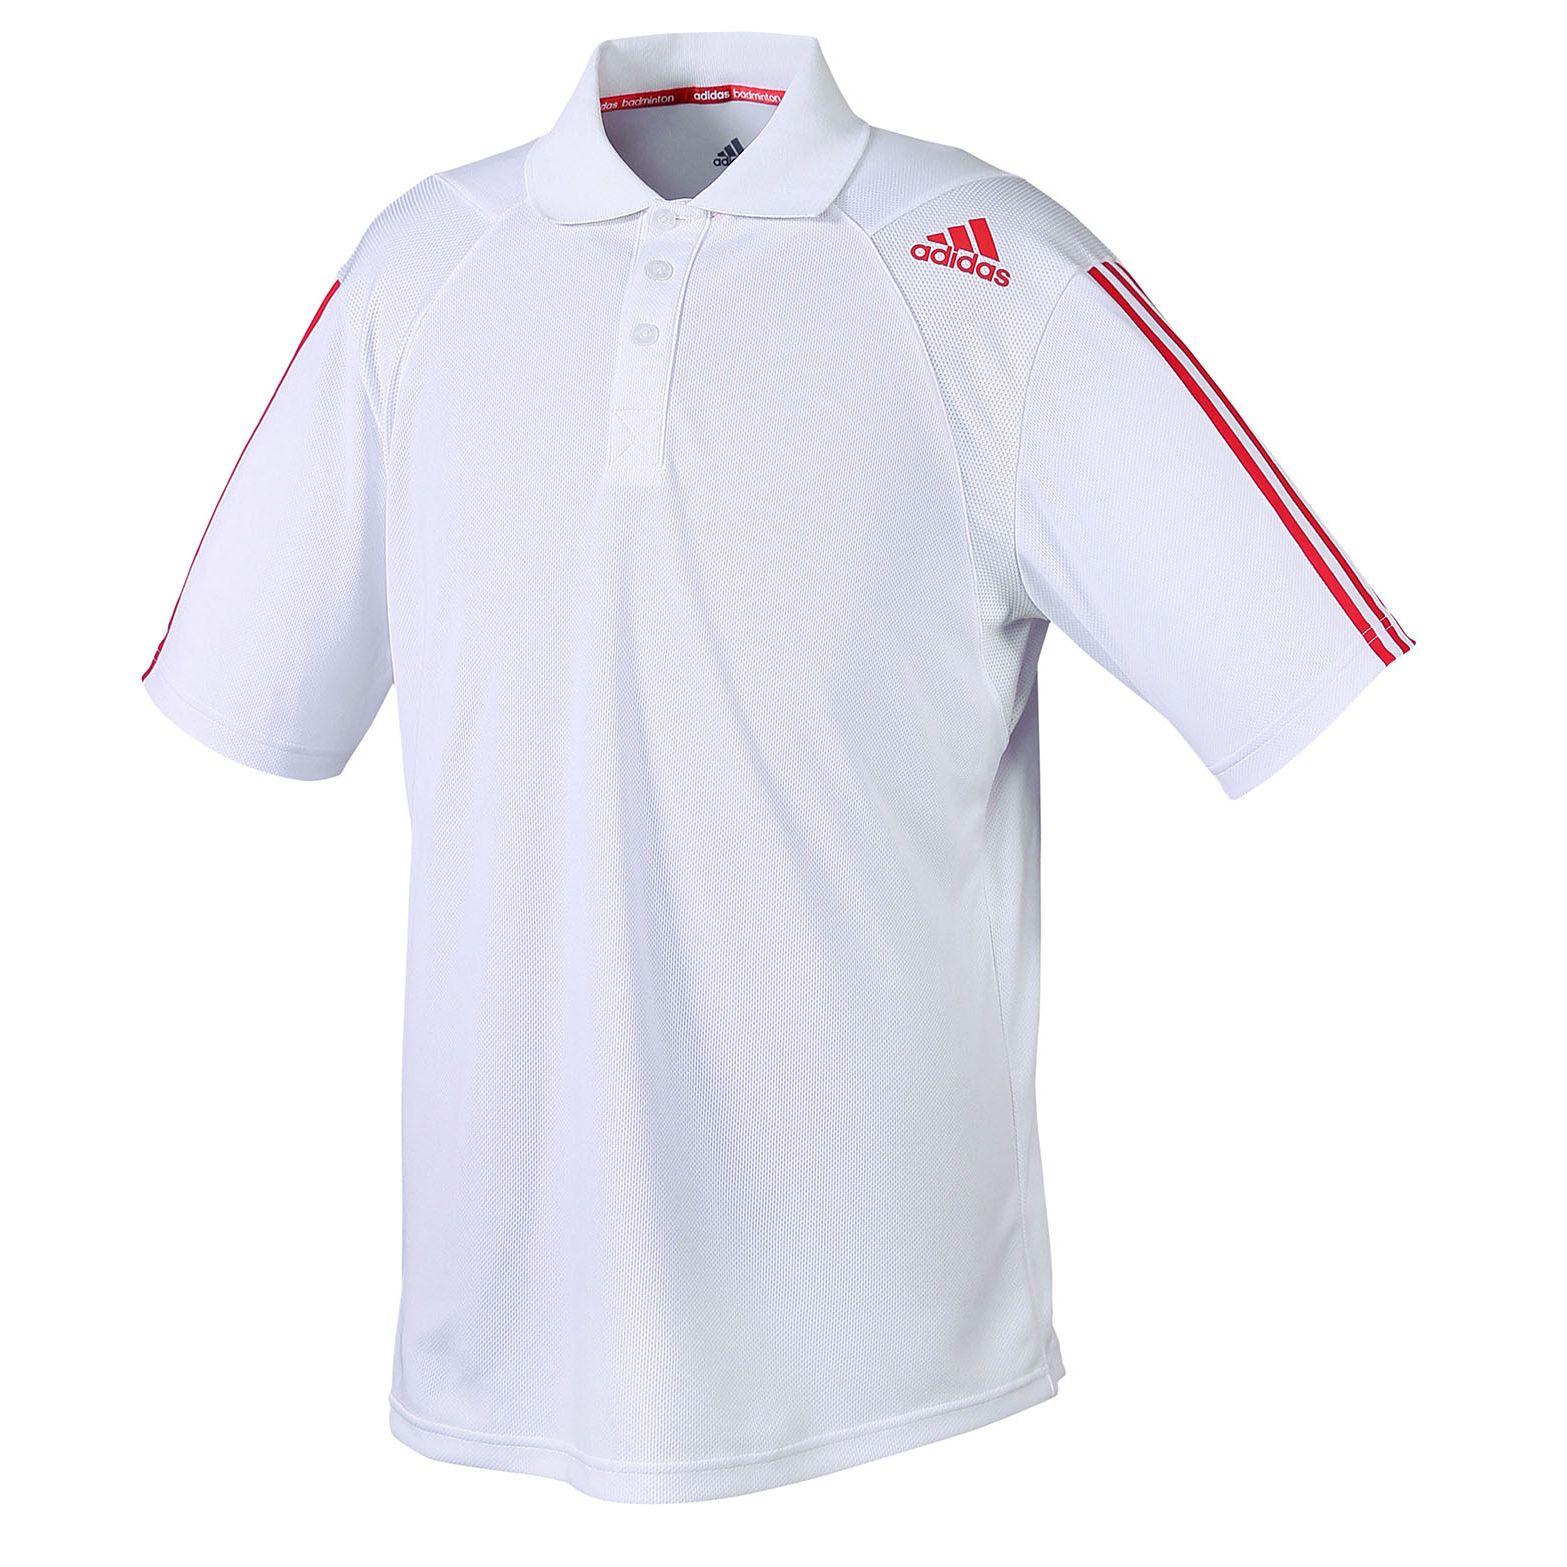 Adidas Climacool Technical Mens Polo Shirt Sweatband Com